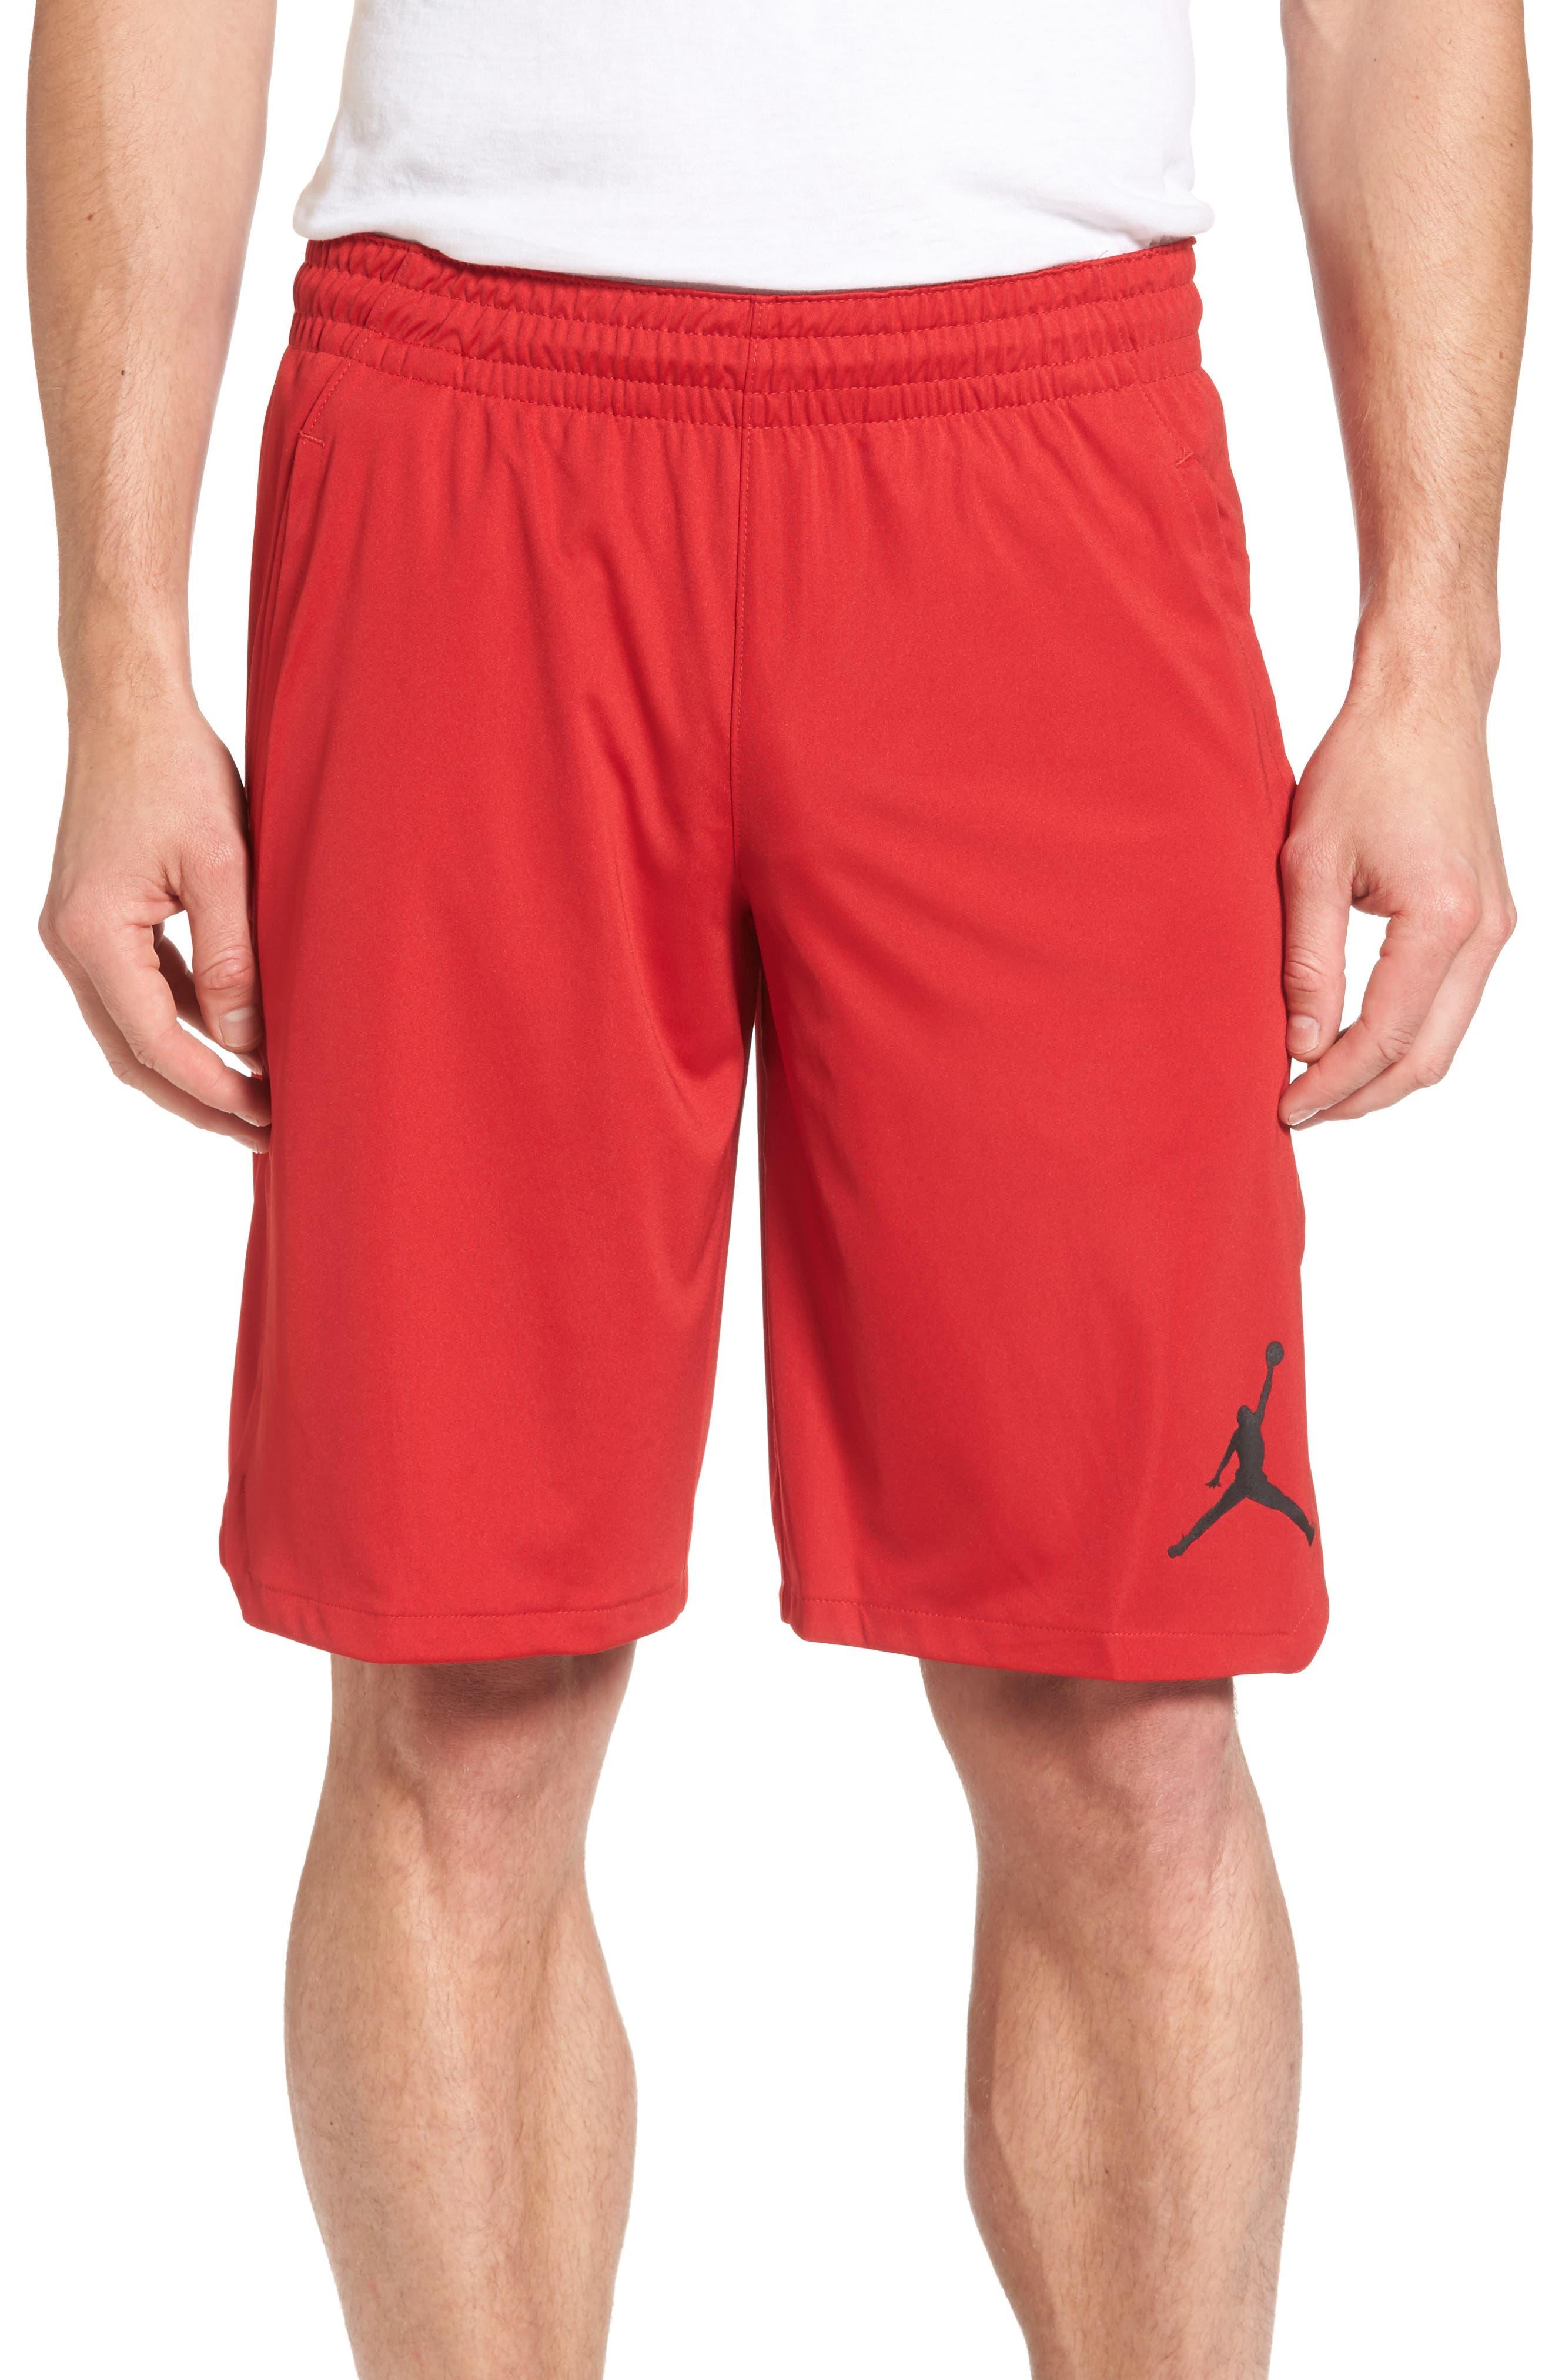 Nike Jordan 23 Alpha Dry Knit Athletic Shorts